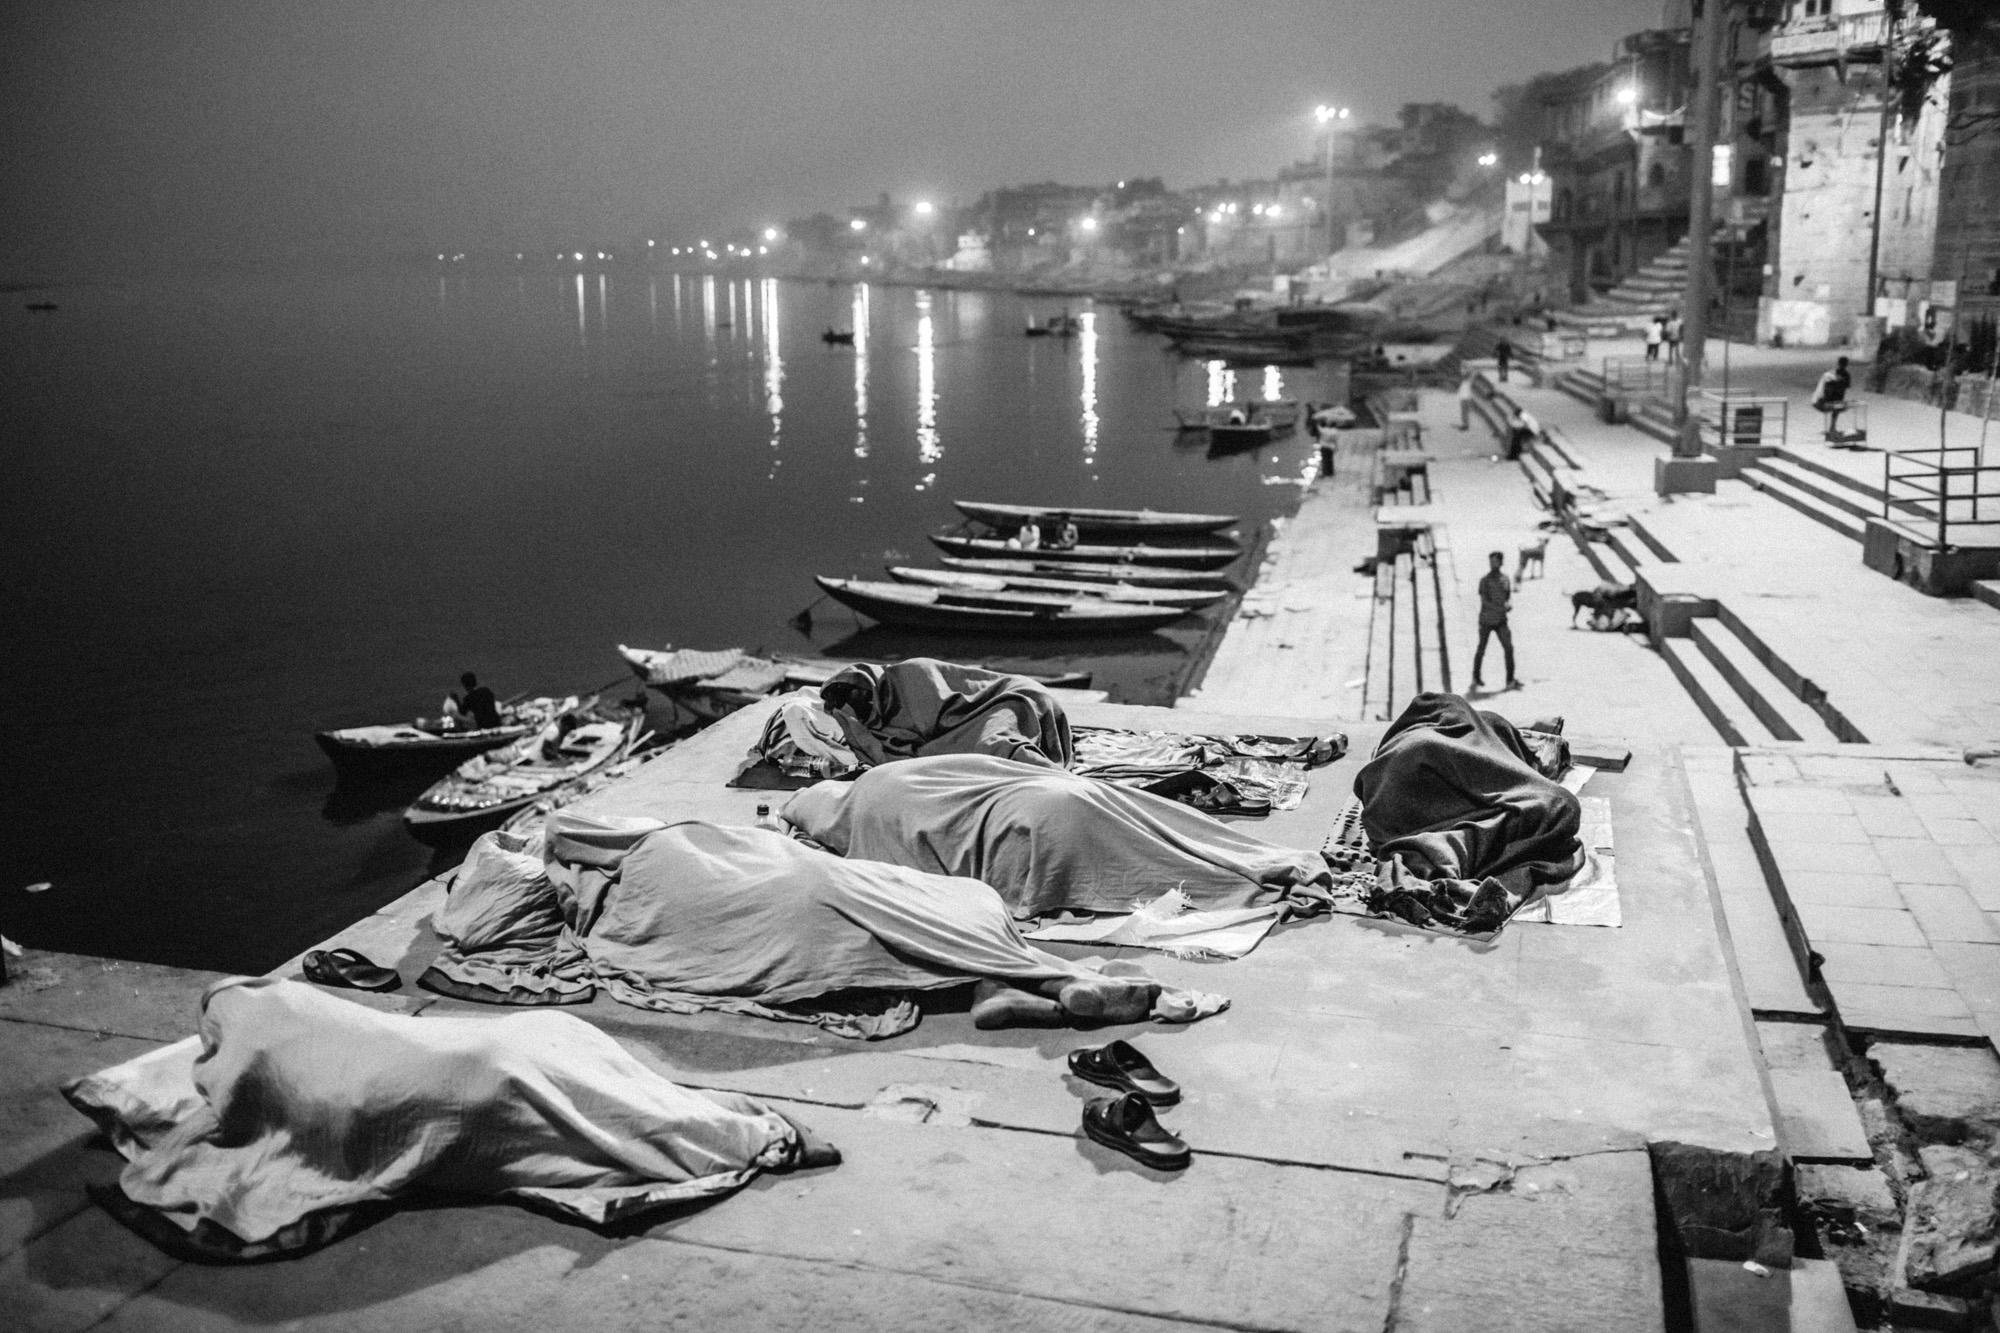 2014_03_27_DB_Varanasi_0888.jpg